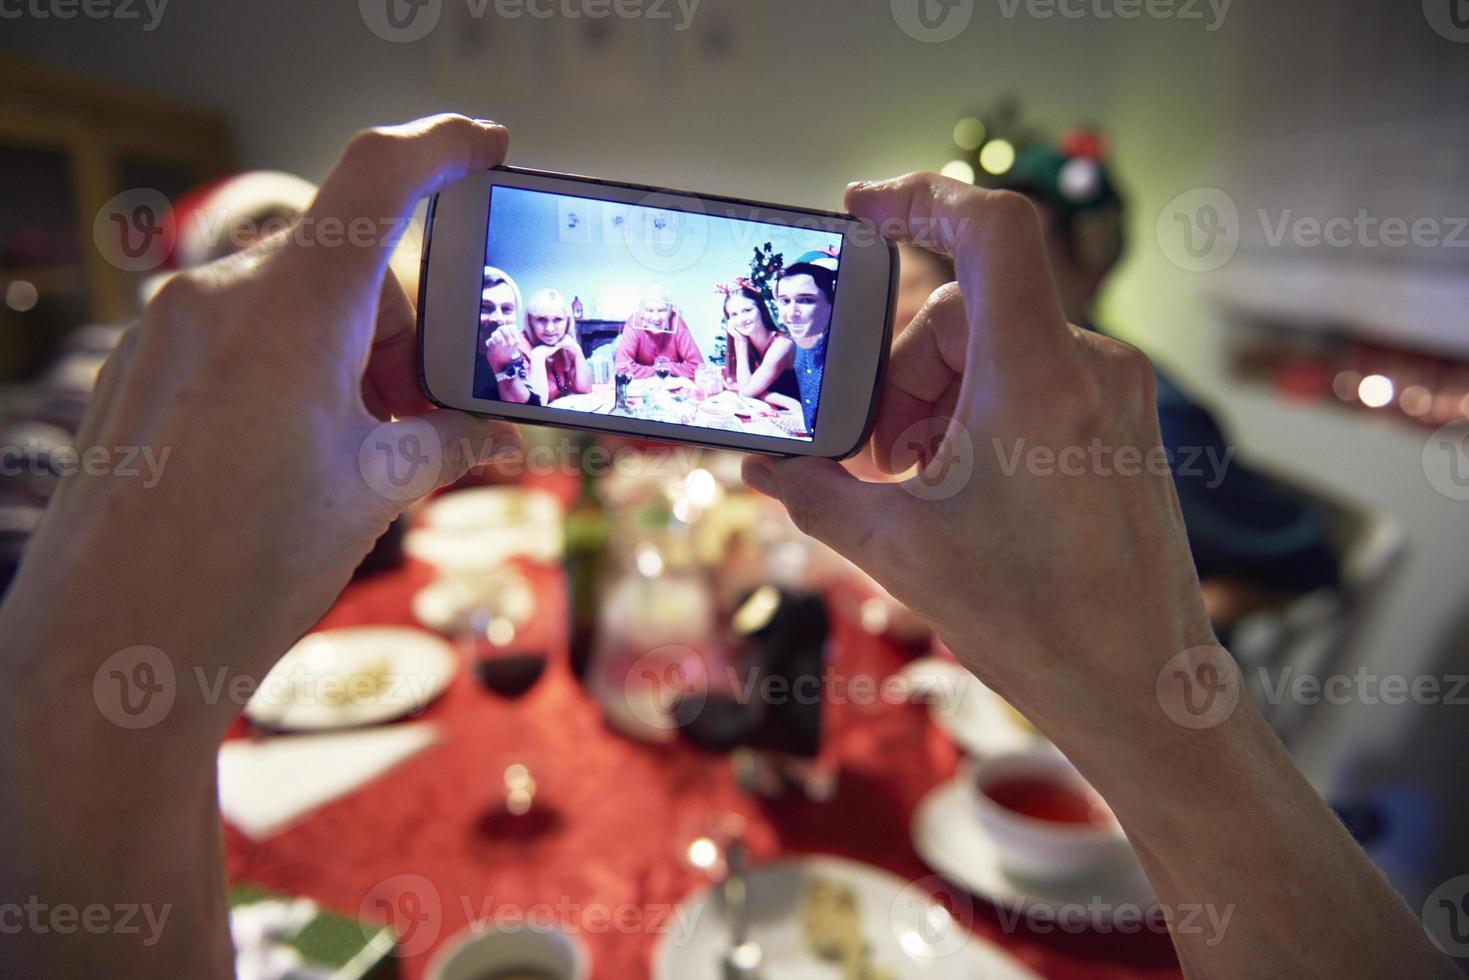 fotografering taget under julafton foto